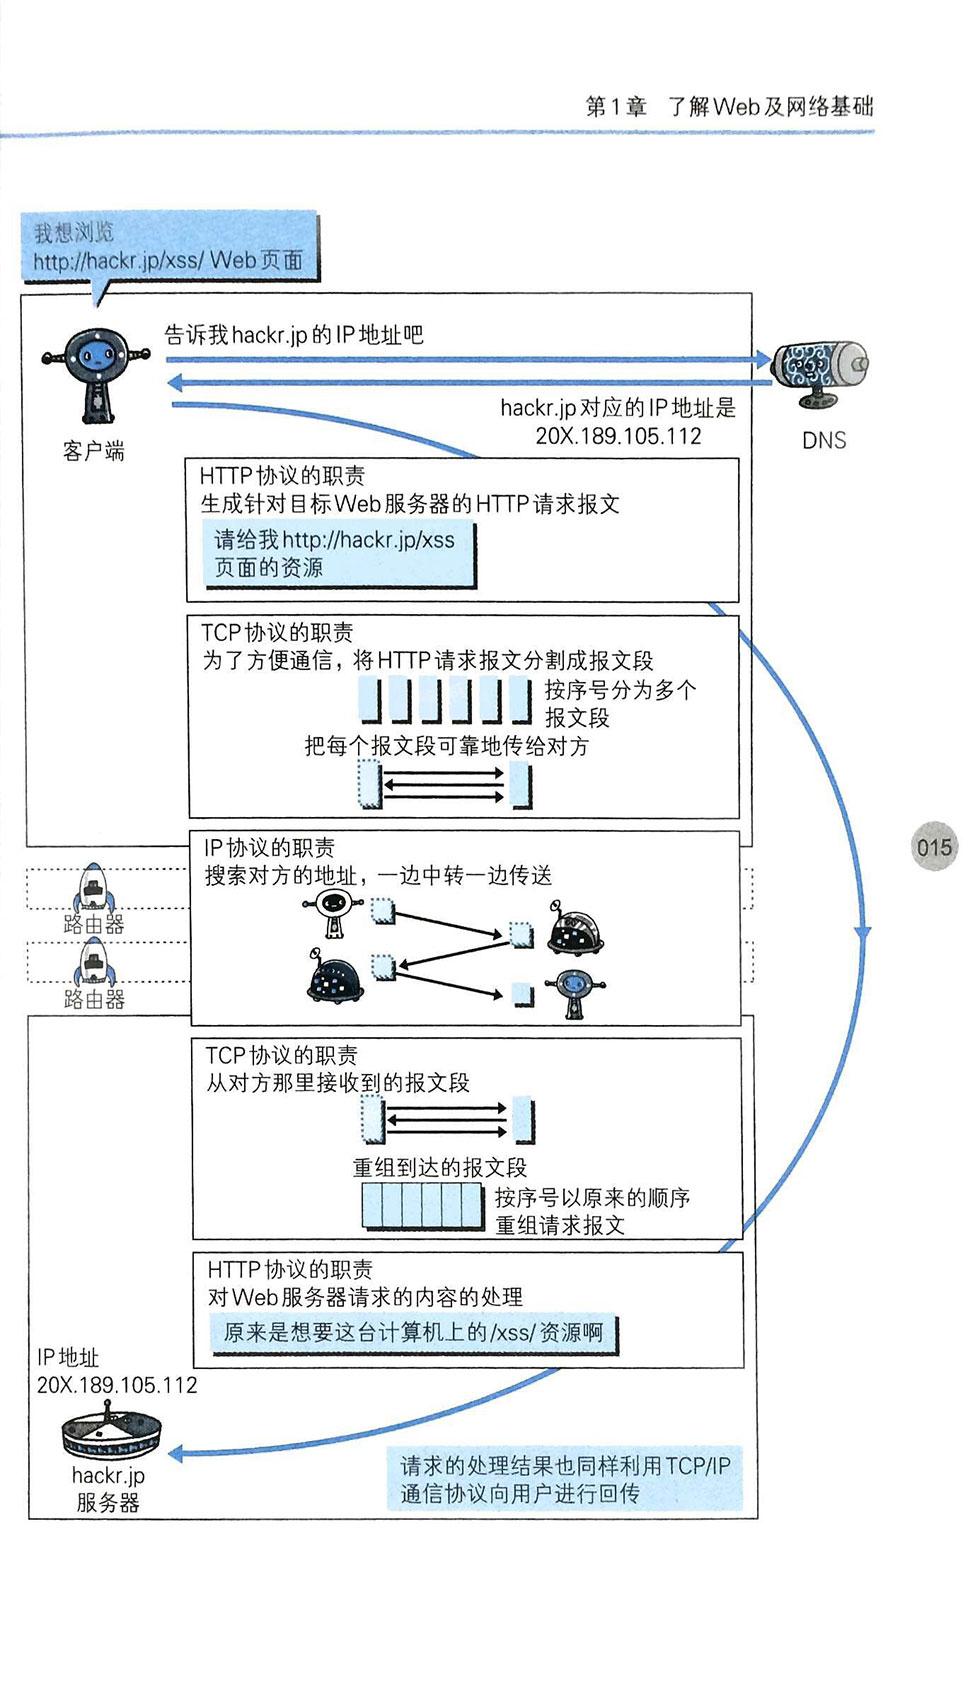 HTTP协议跟其他协议的关系